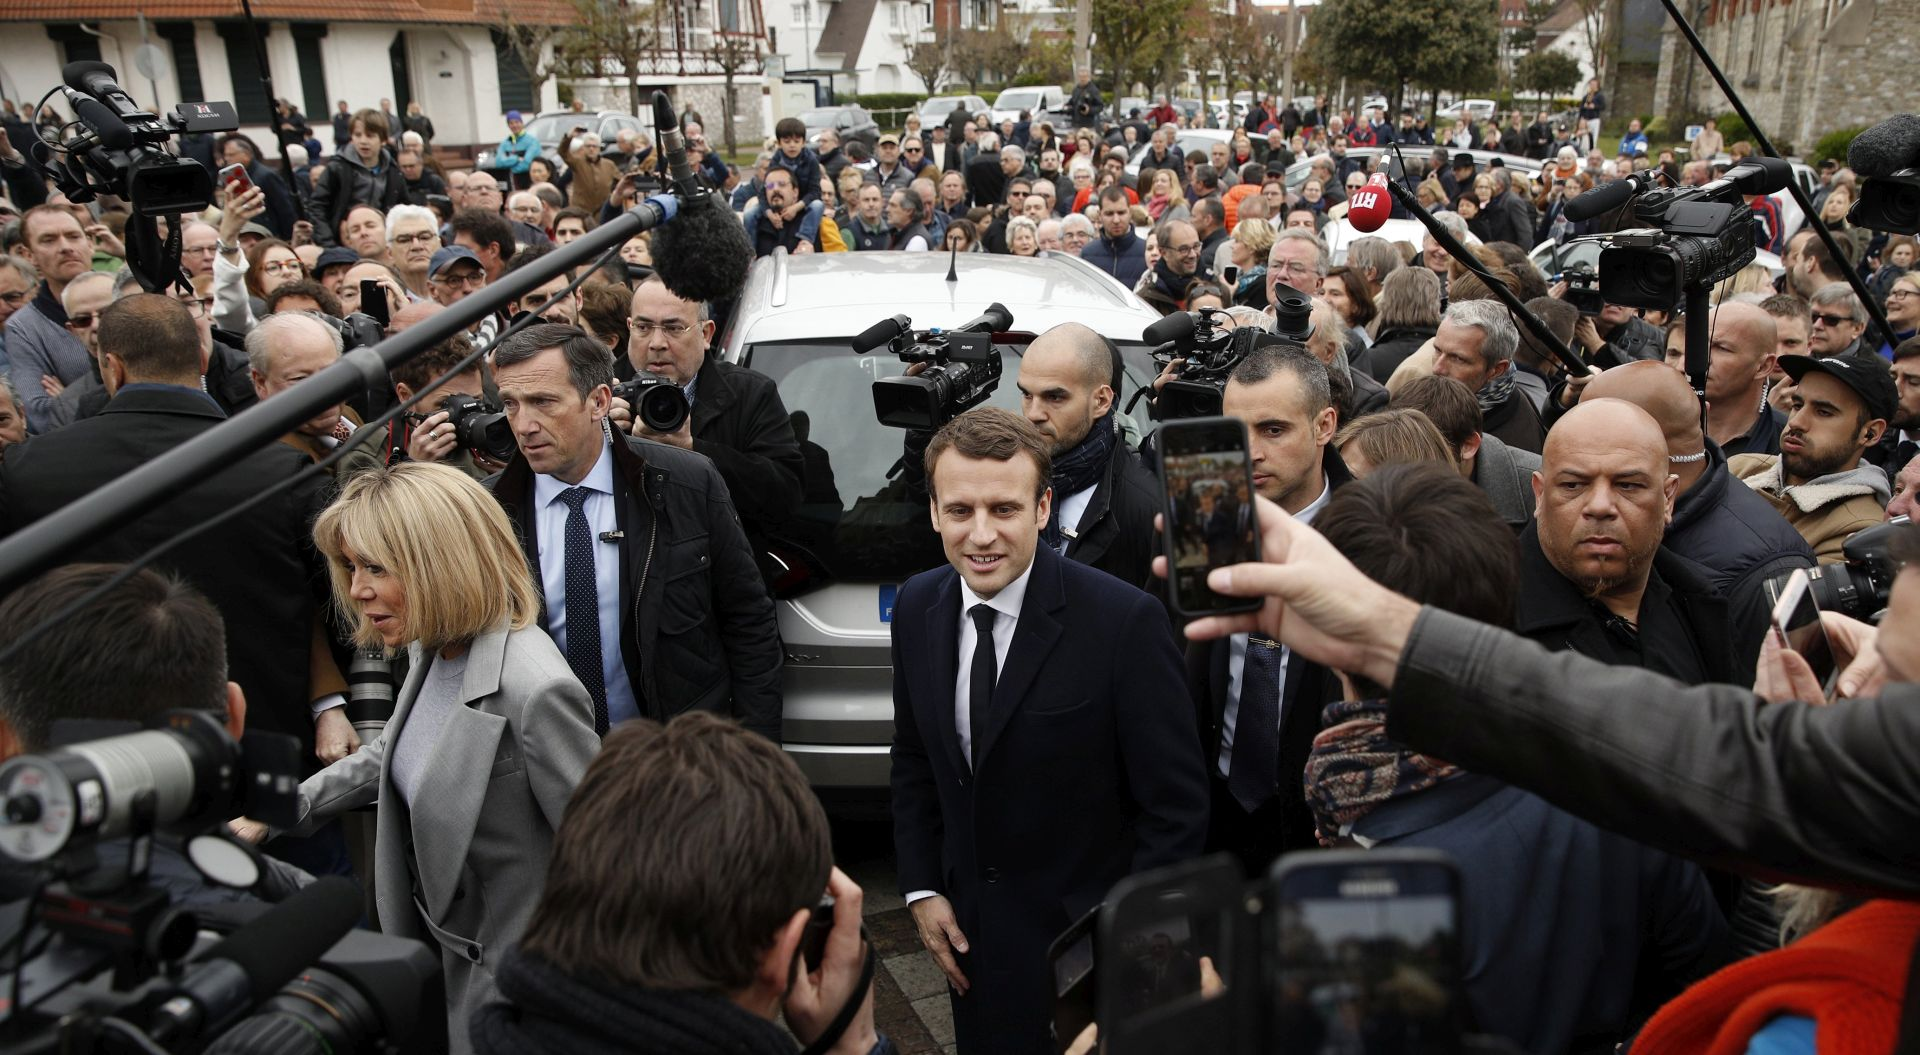 PRVI DIJELOMIČNI IZBORNI REZULTATI Macron i Le Pen ulaze u drugi krug